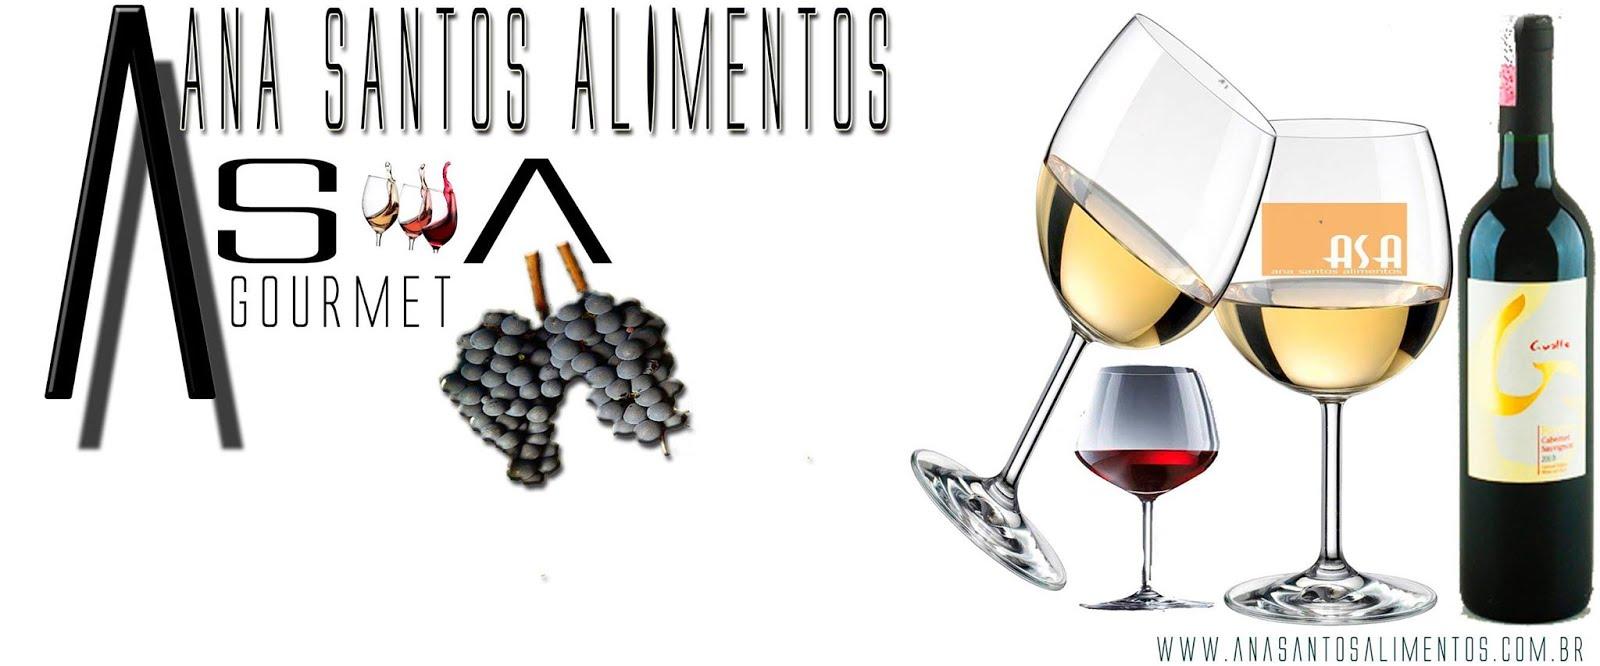 Propagandas Vinhos Asa Gourmet